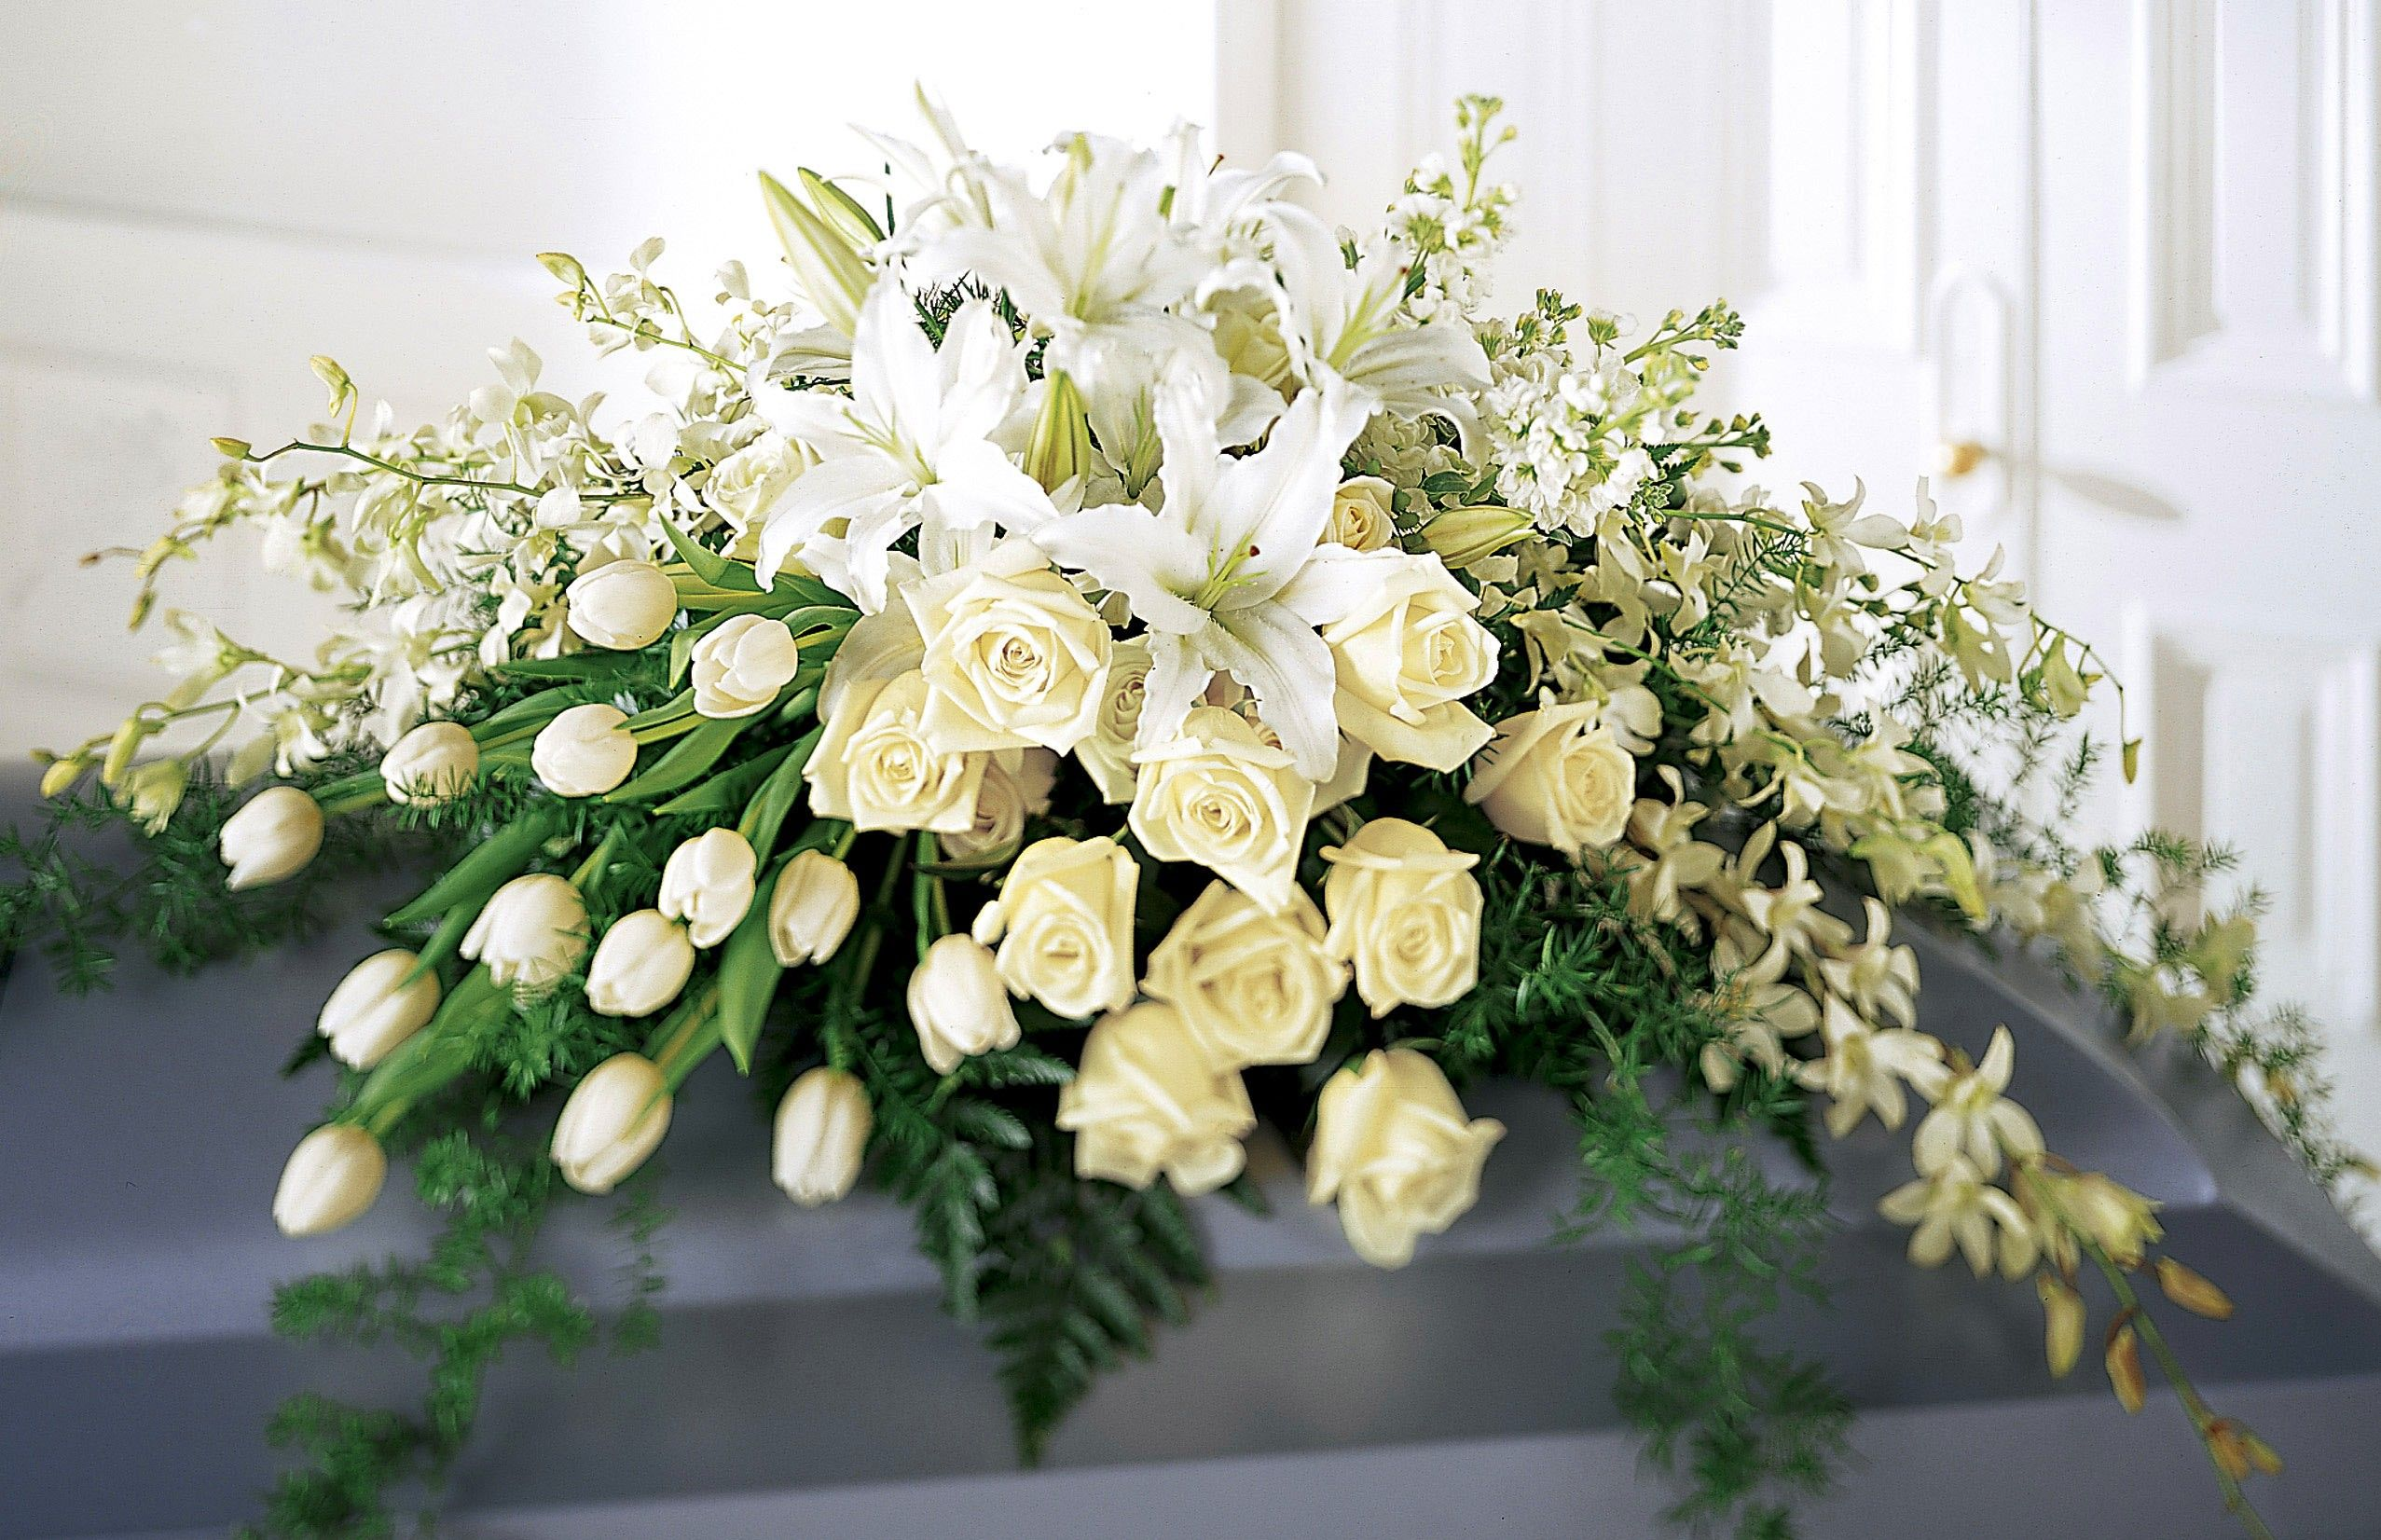 White memories casket spray cs2 plants pinterest casket white memories casket spray cs2 izmirmasajfo